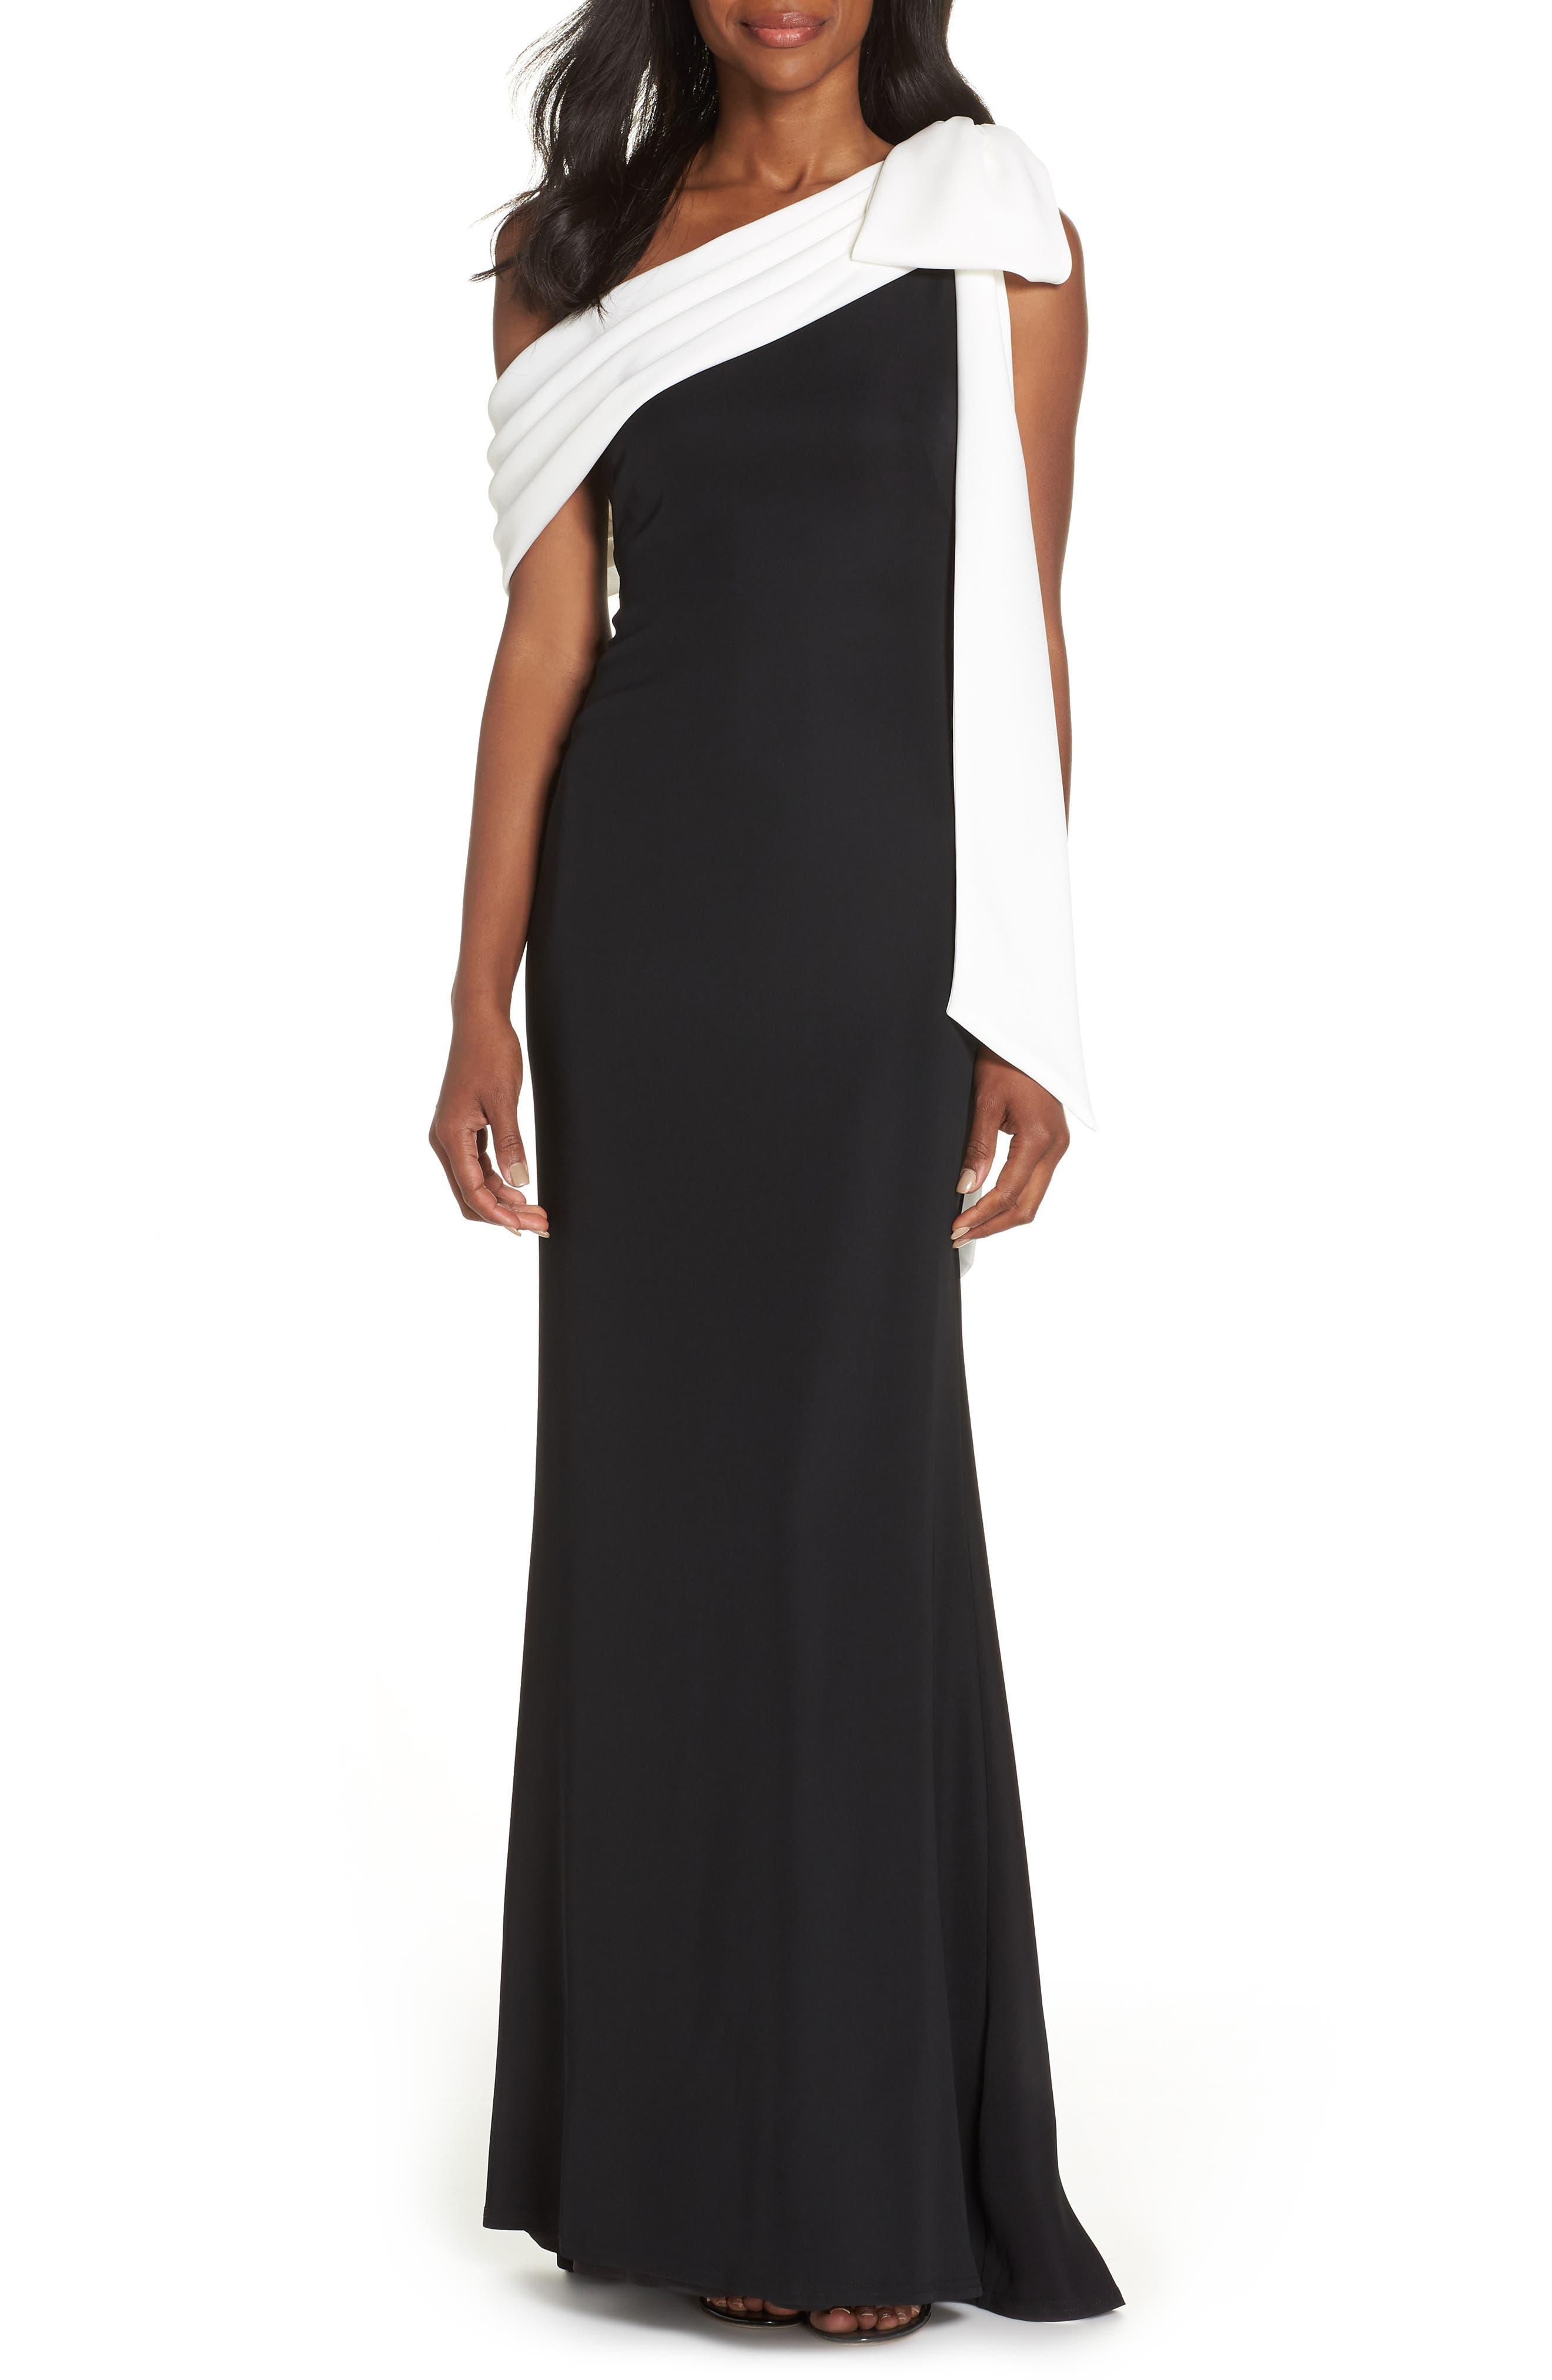 70s Dresses – Disco Dress, Hippie Dress, Wrap Dress Womens Tadashi Shoji Crepe Gown Size 2 - Black $368.00 AT vintagedancer.com